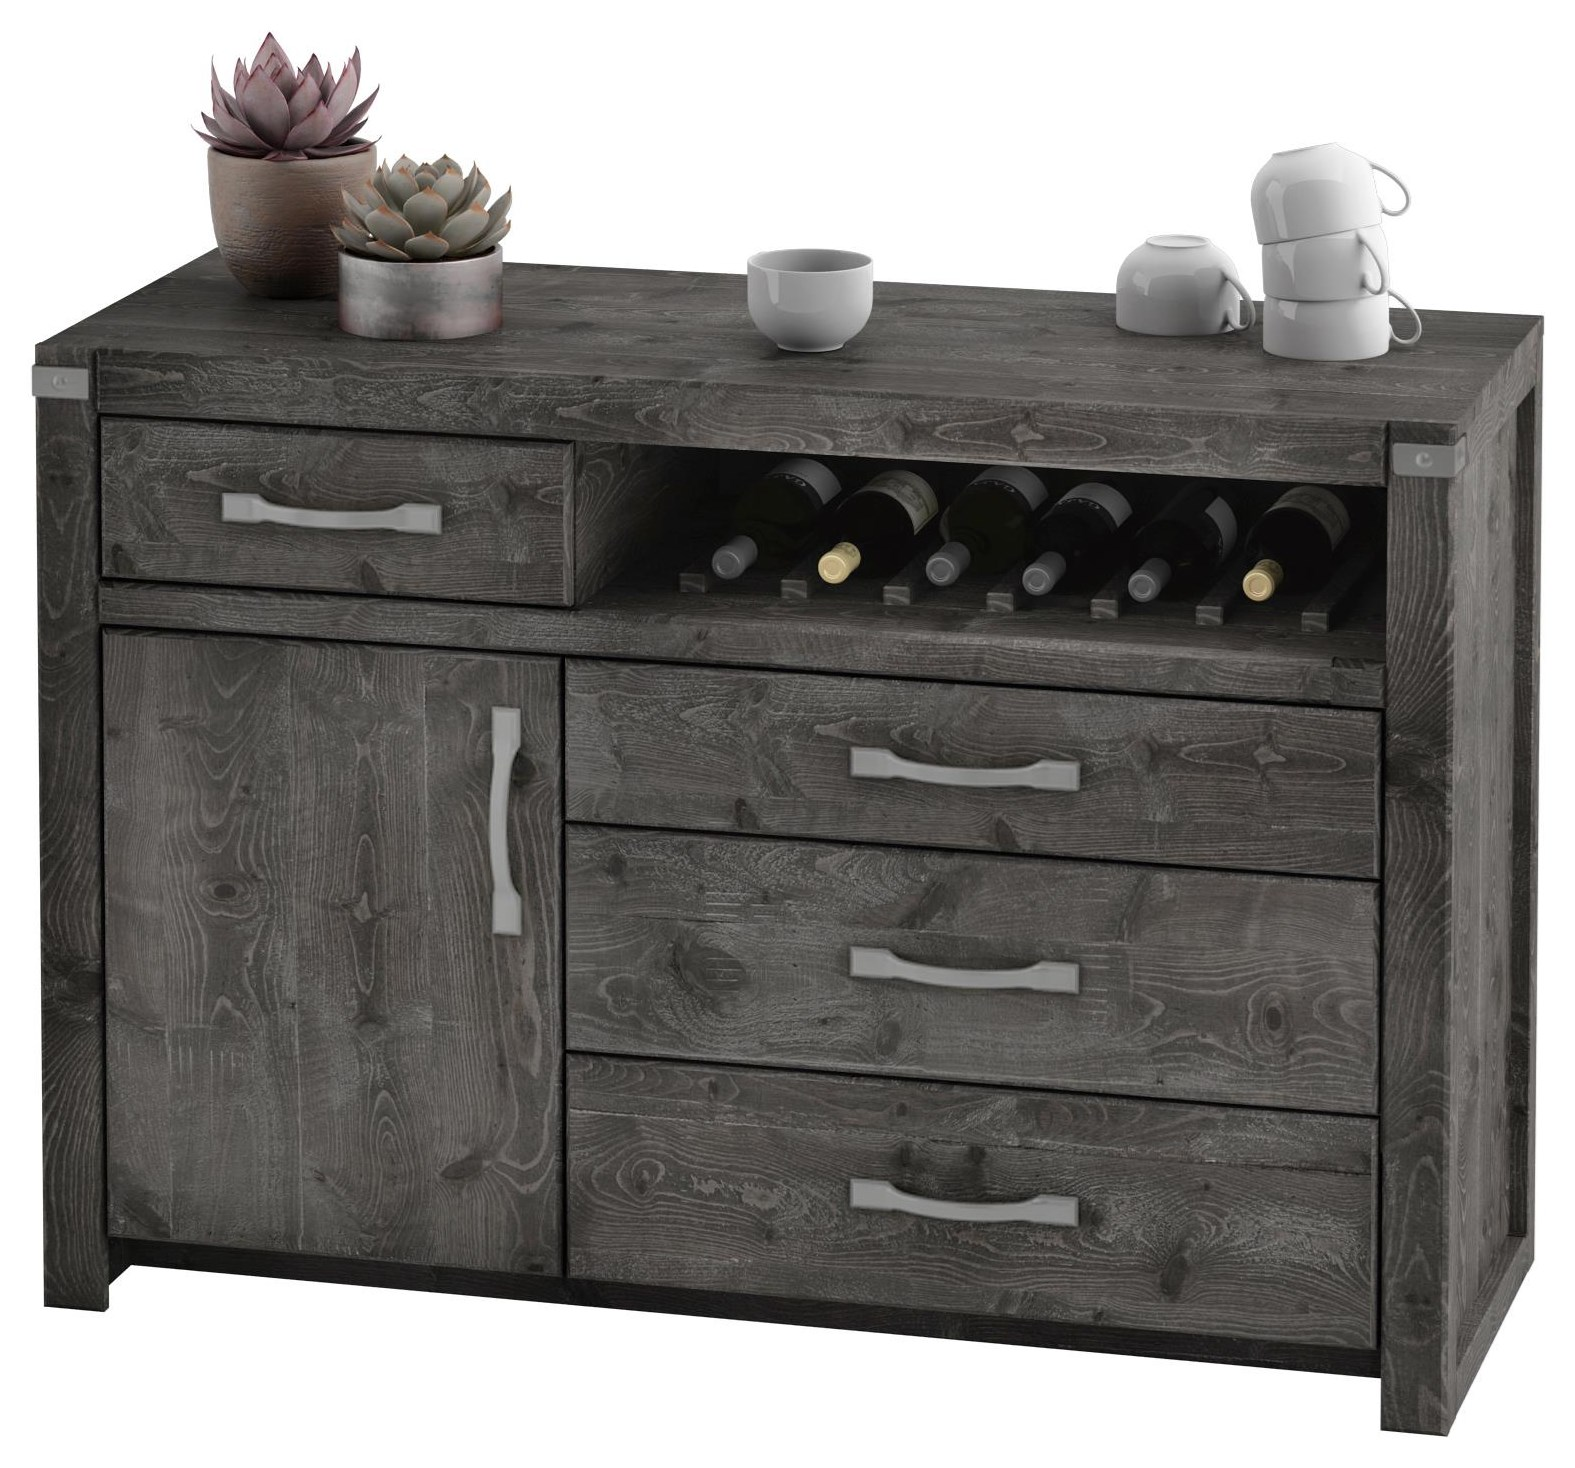 177 Server, Edgewood - Slate by Defehr at Stoney Creek Furniture